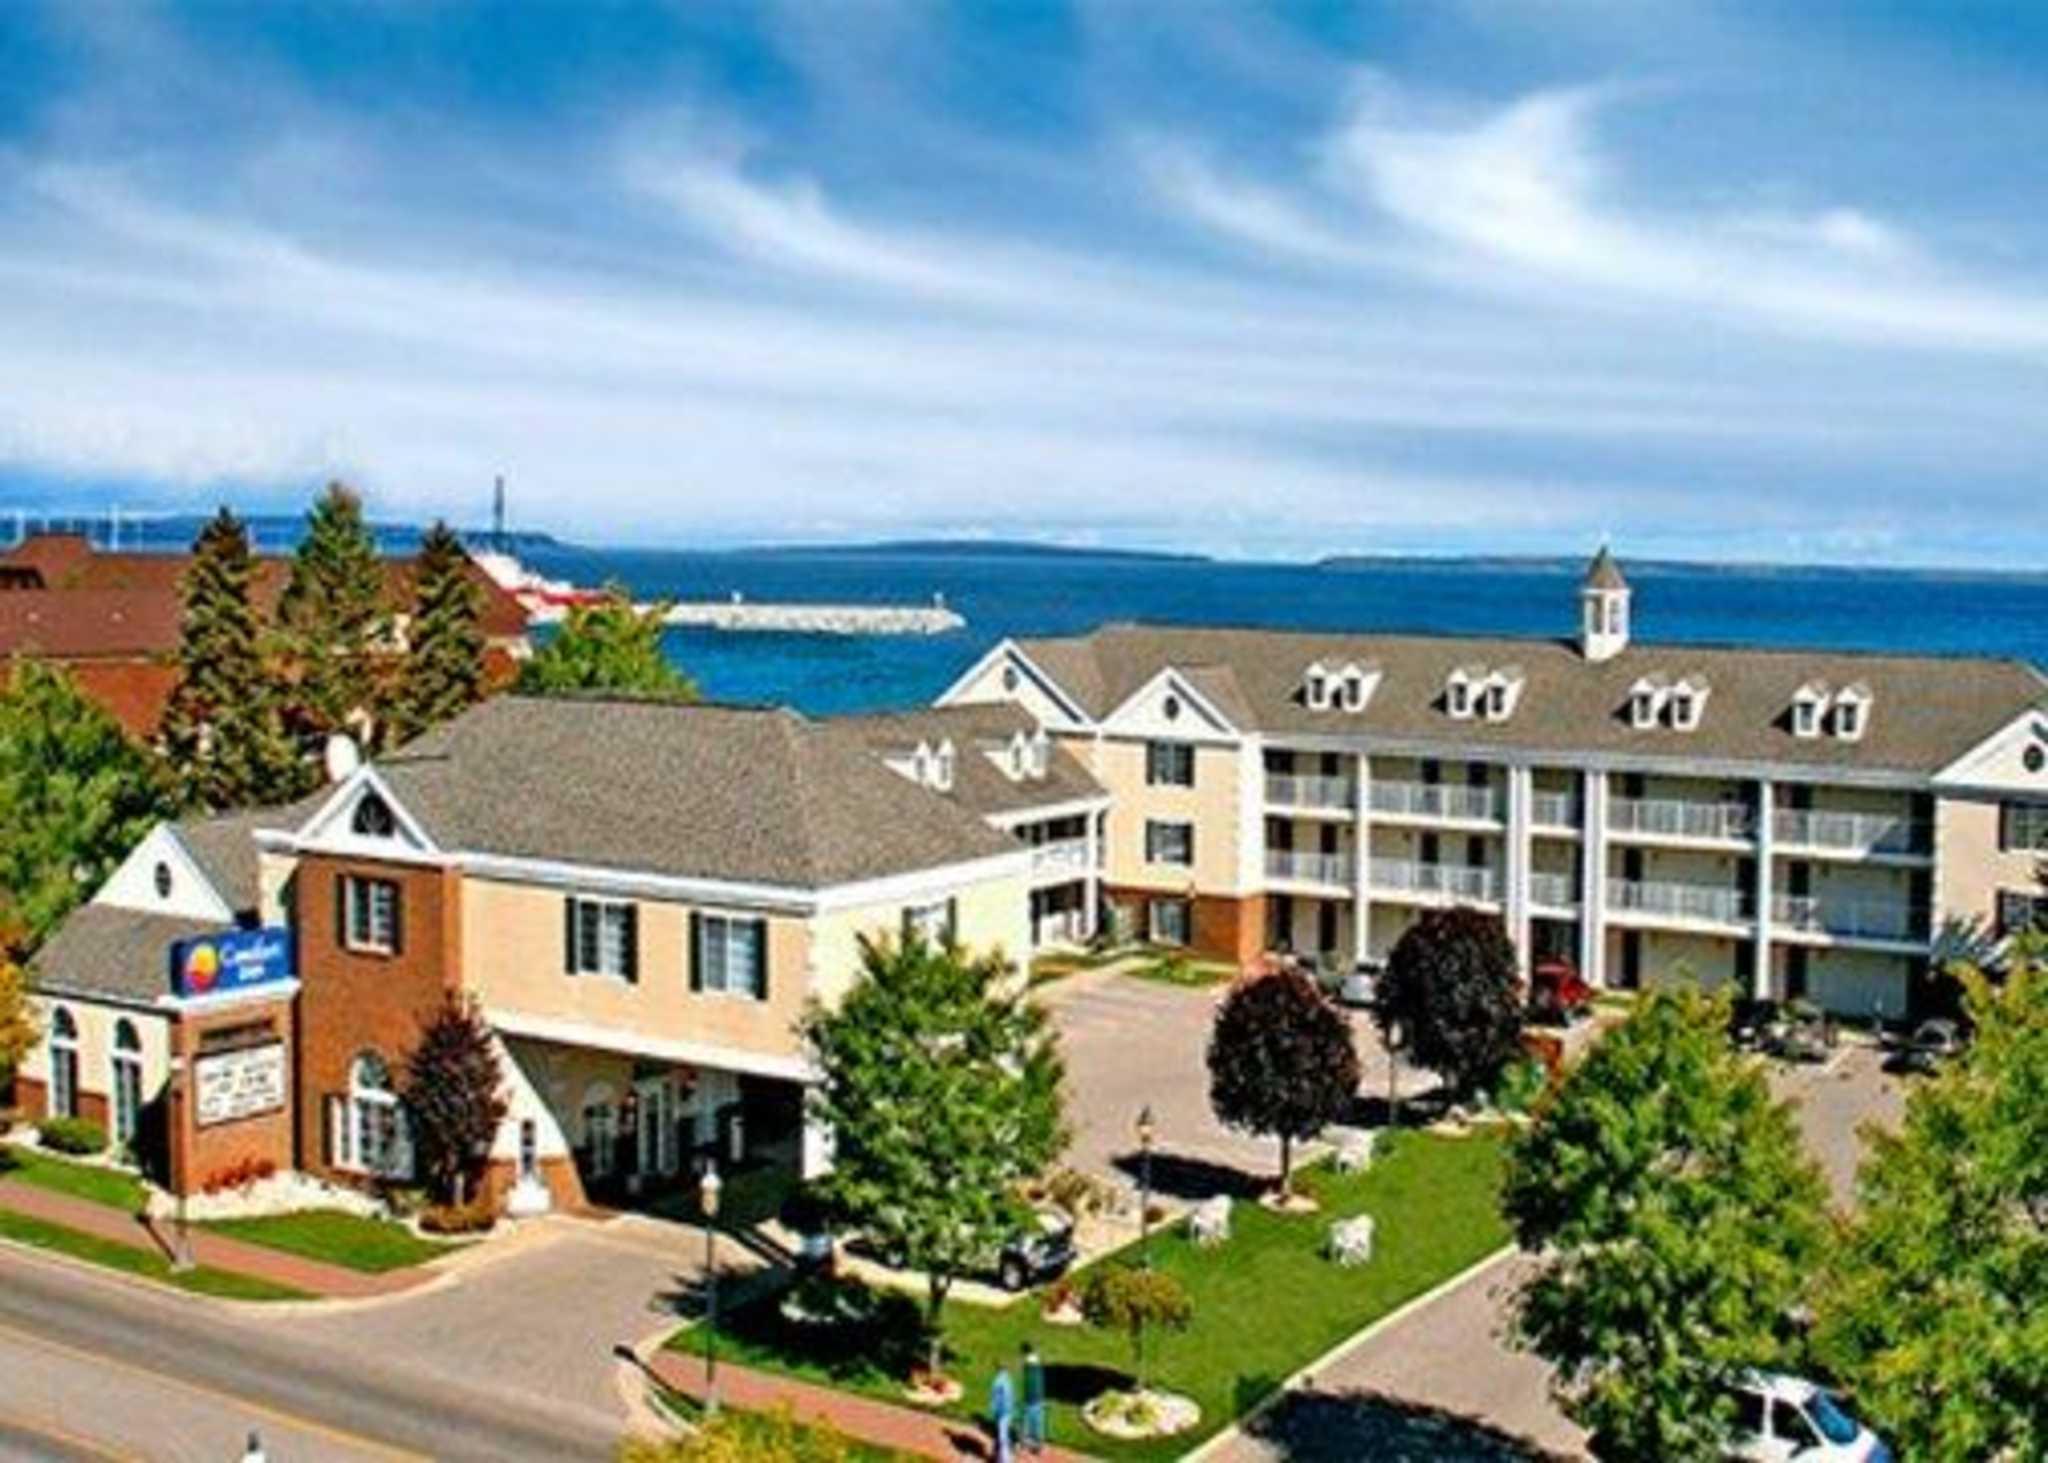 Comfort Inn Lakeside Coupons Mackinaw City Mi Near Me